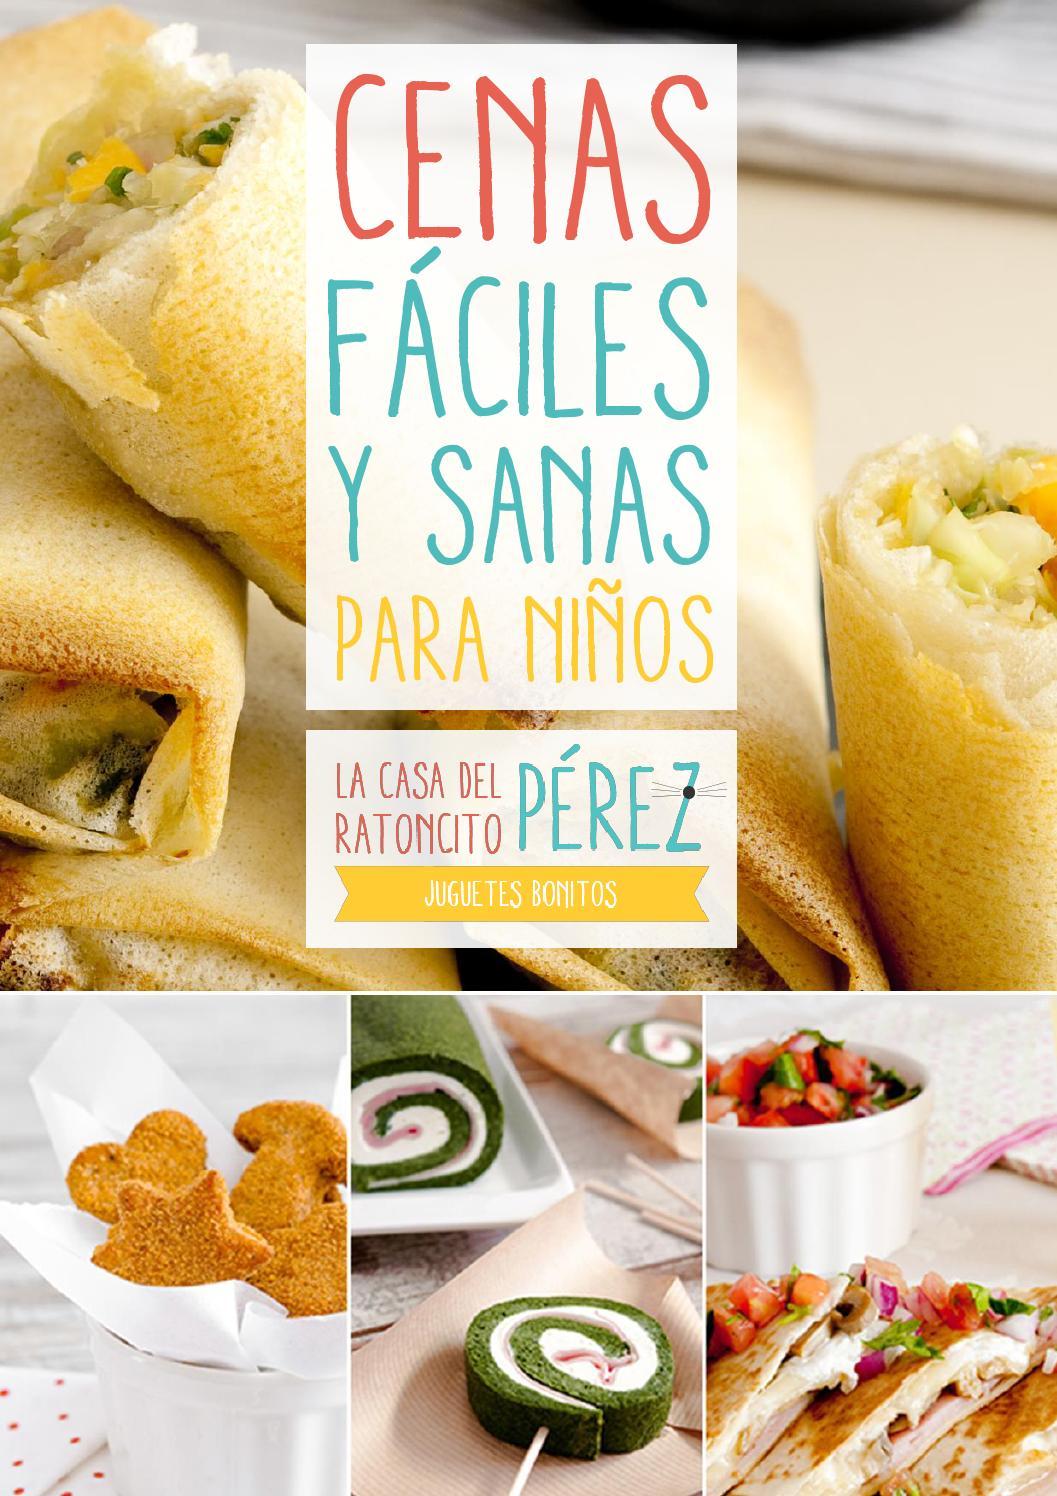 Cenas faciles y sanas para ninos by karina martinez issuu for Cocinar comida sana